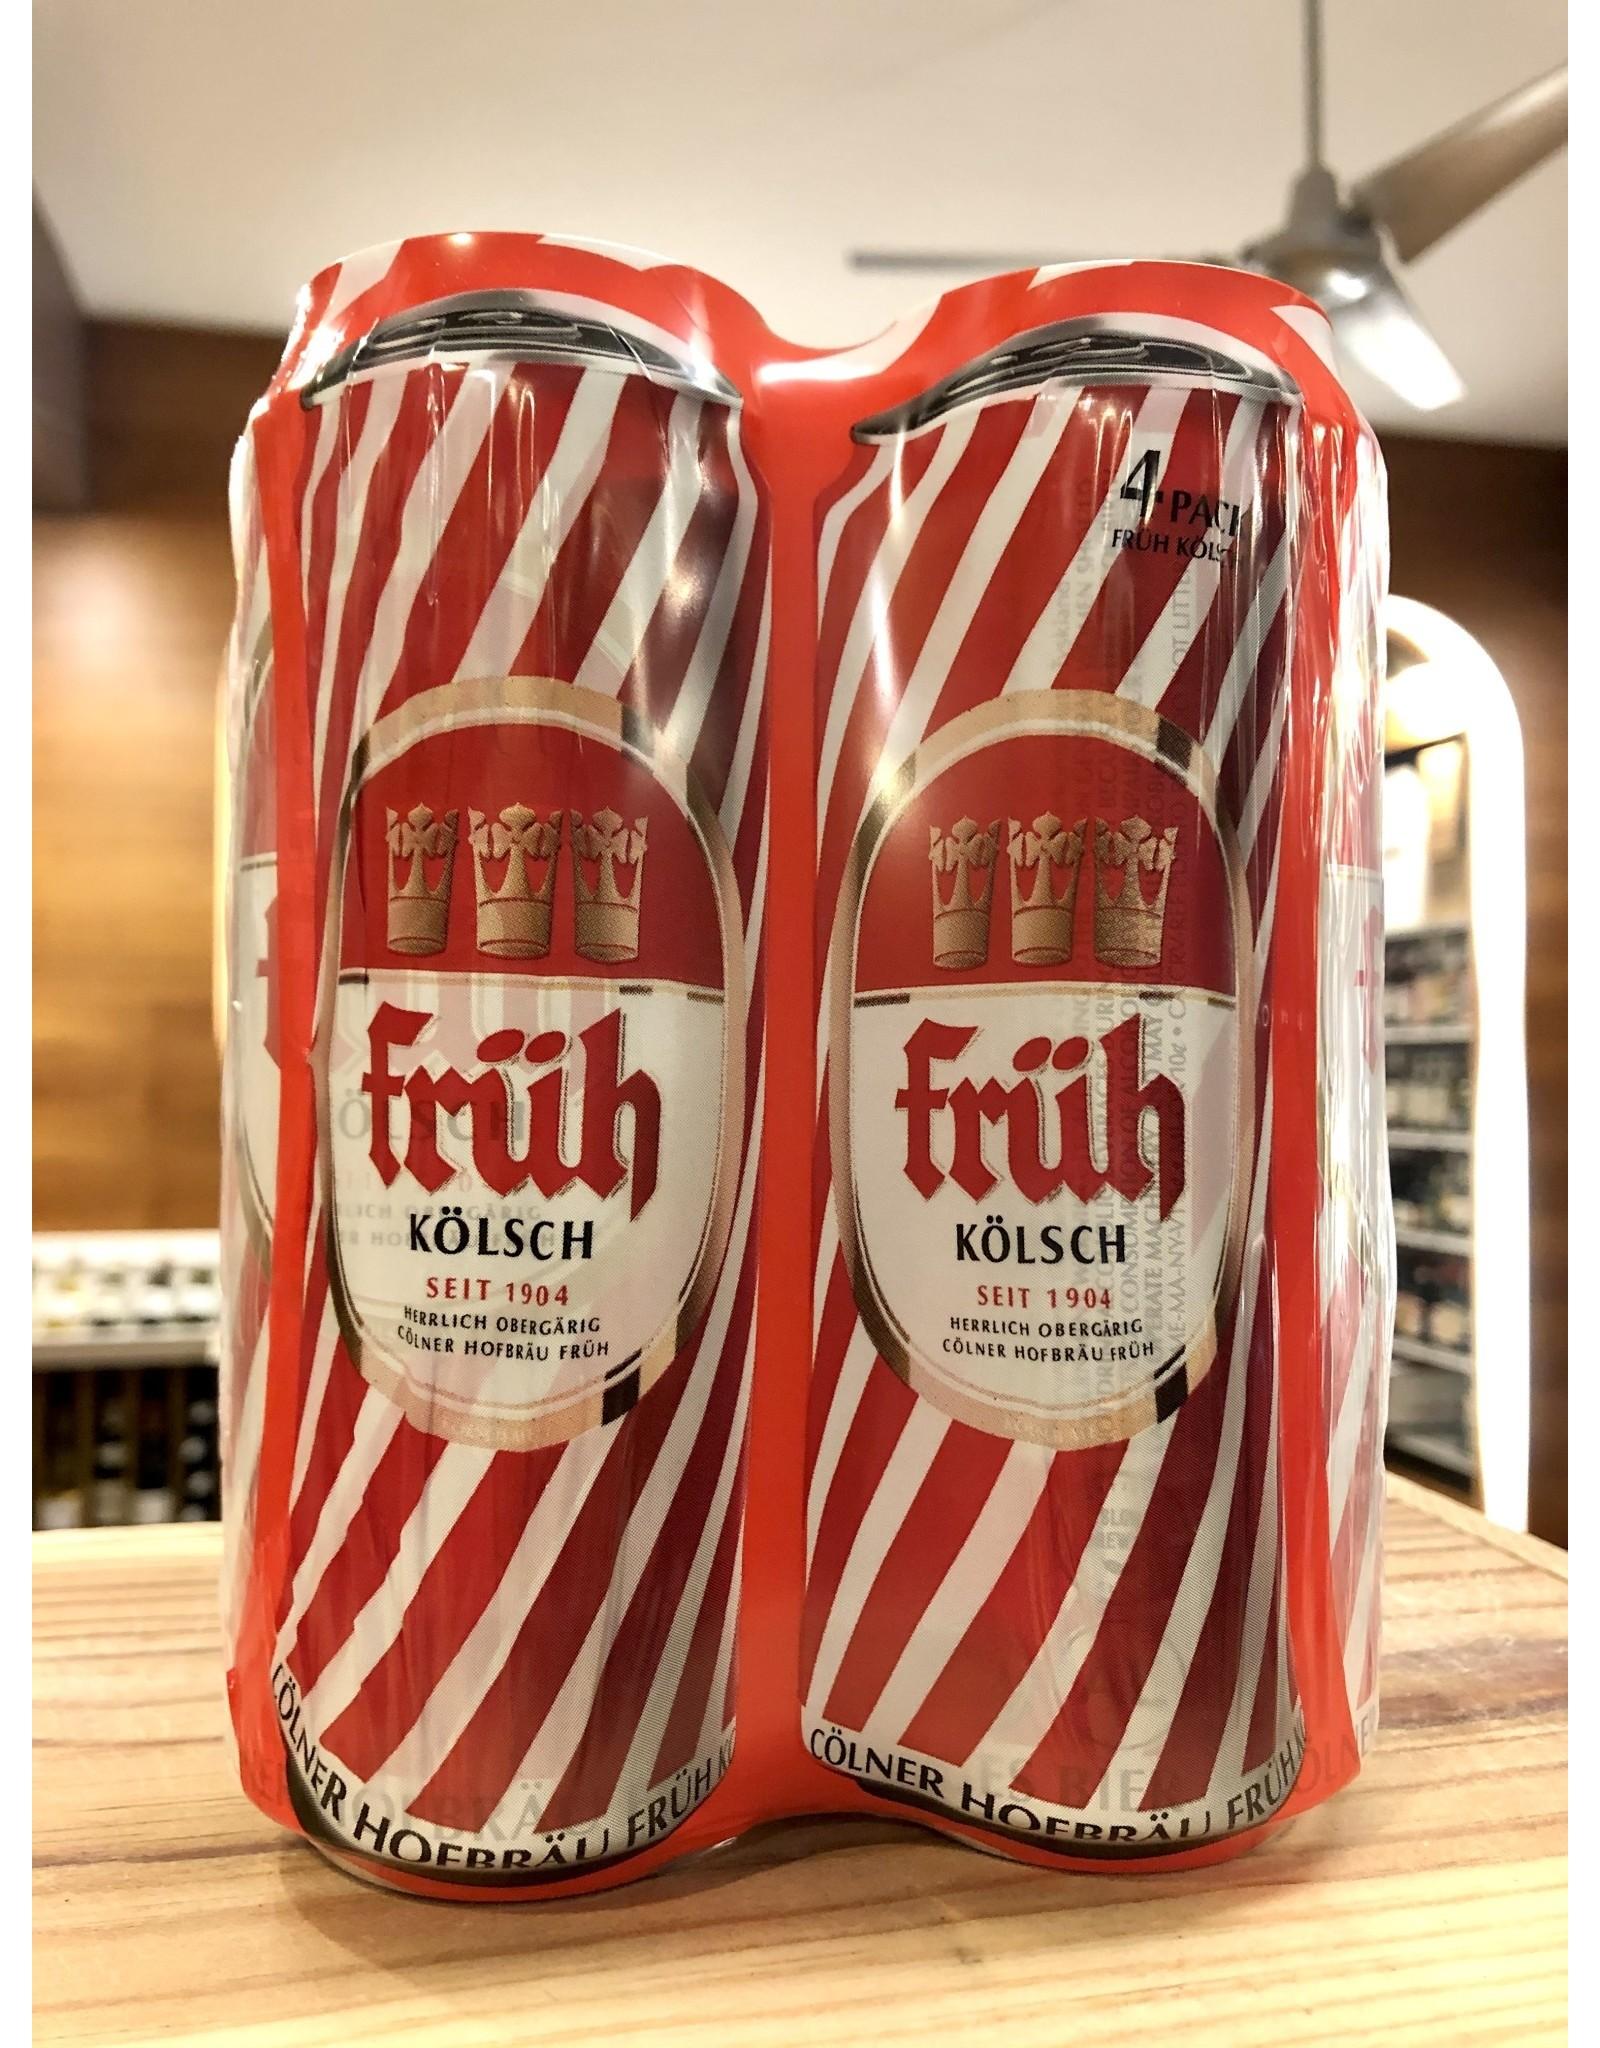 Fruh Kolsch Cans - 4x16.9 oz.